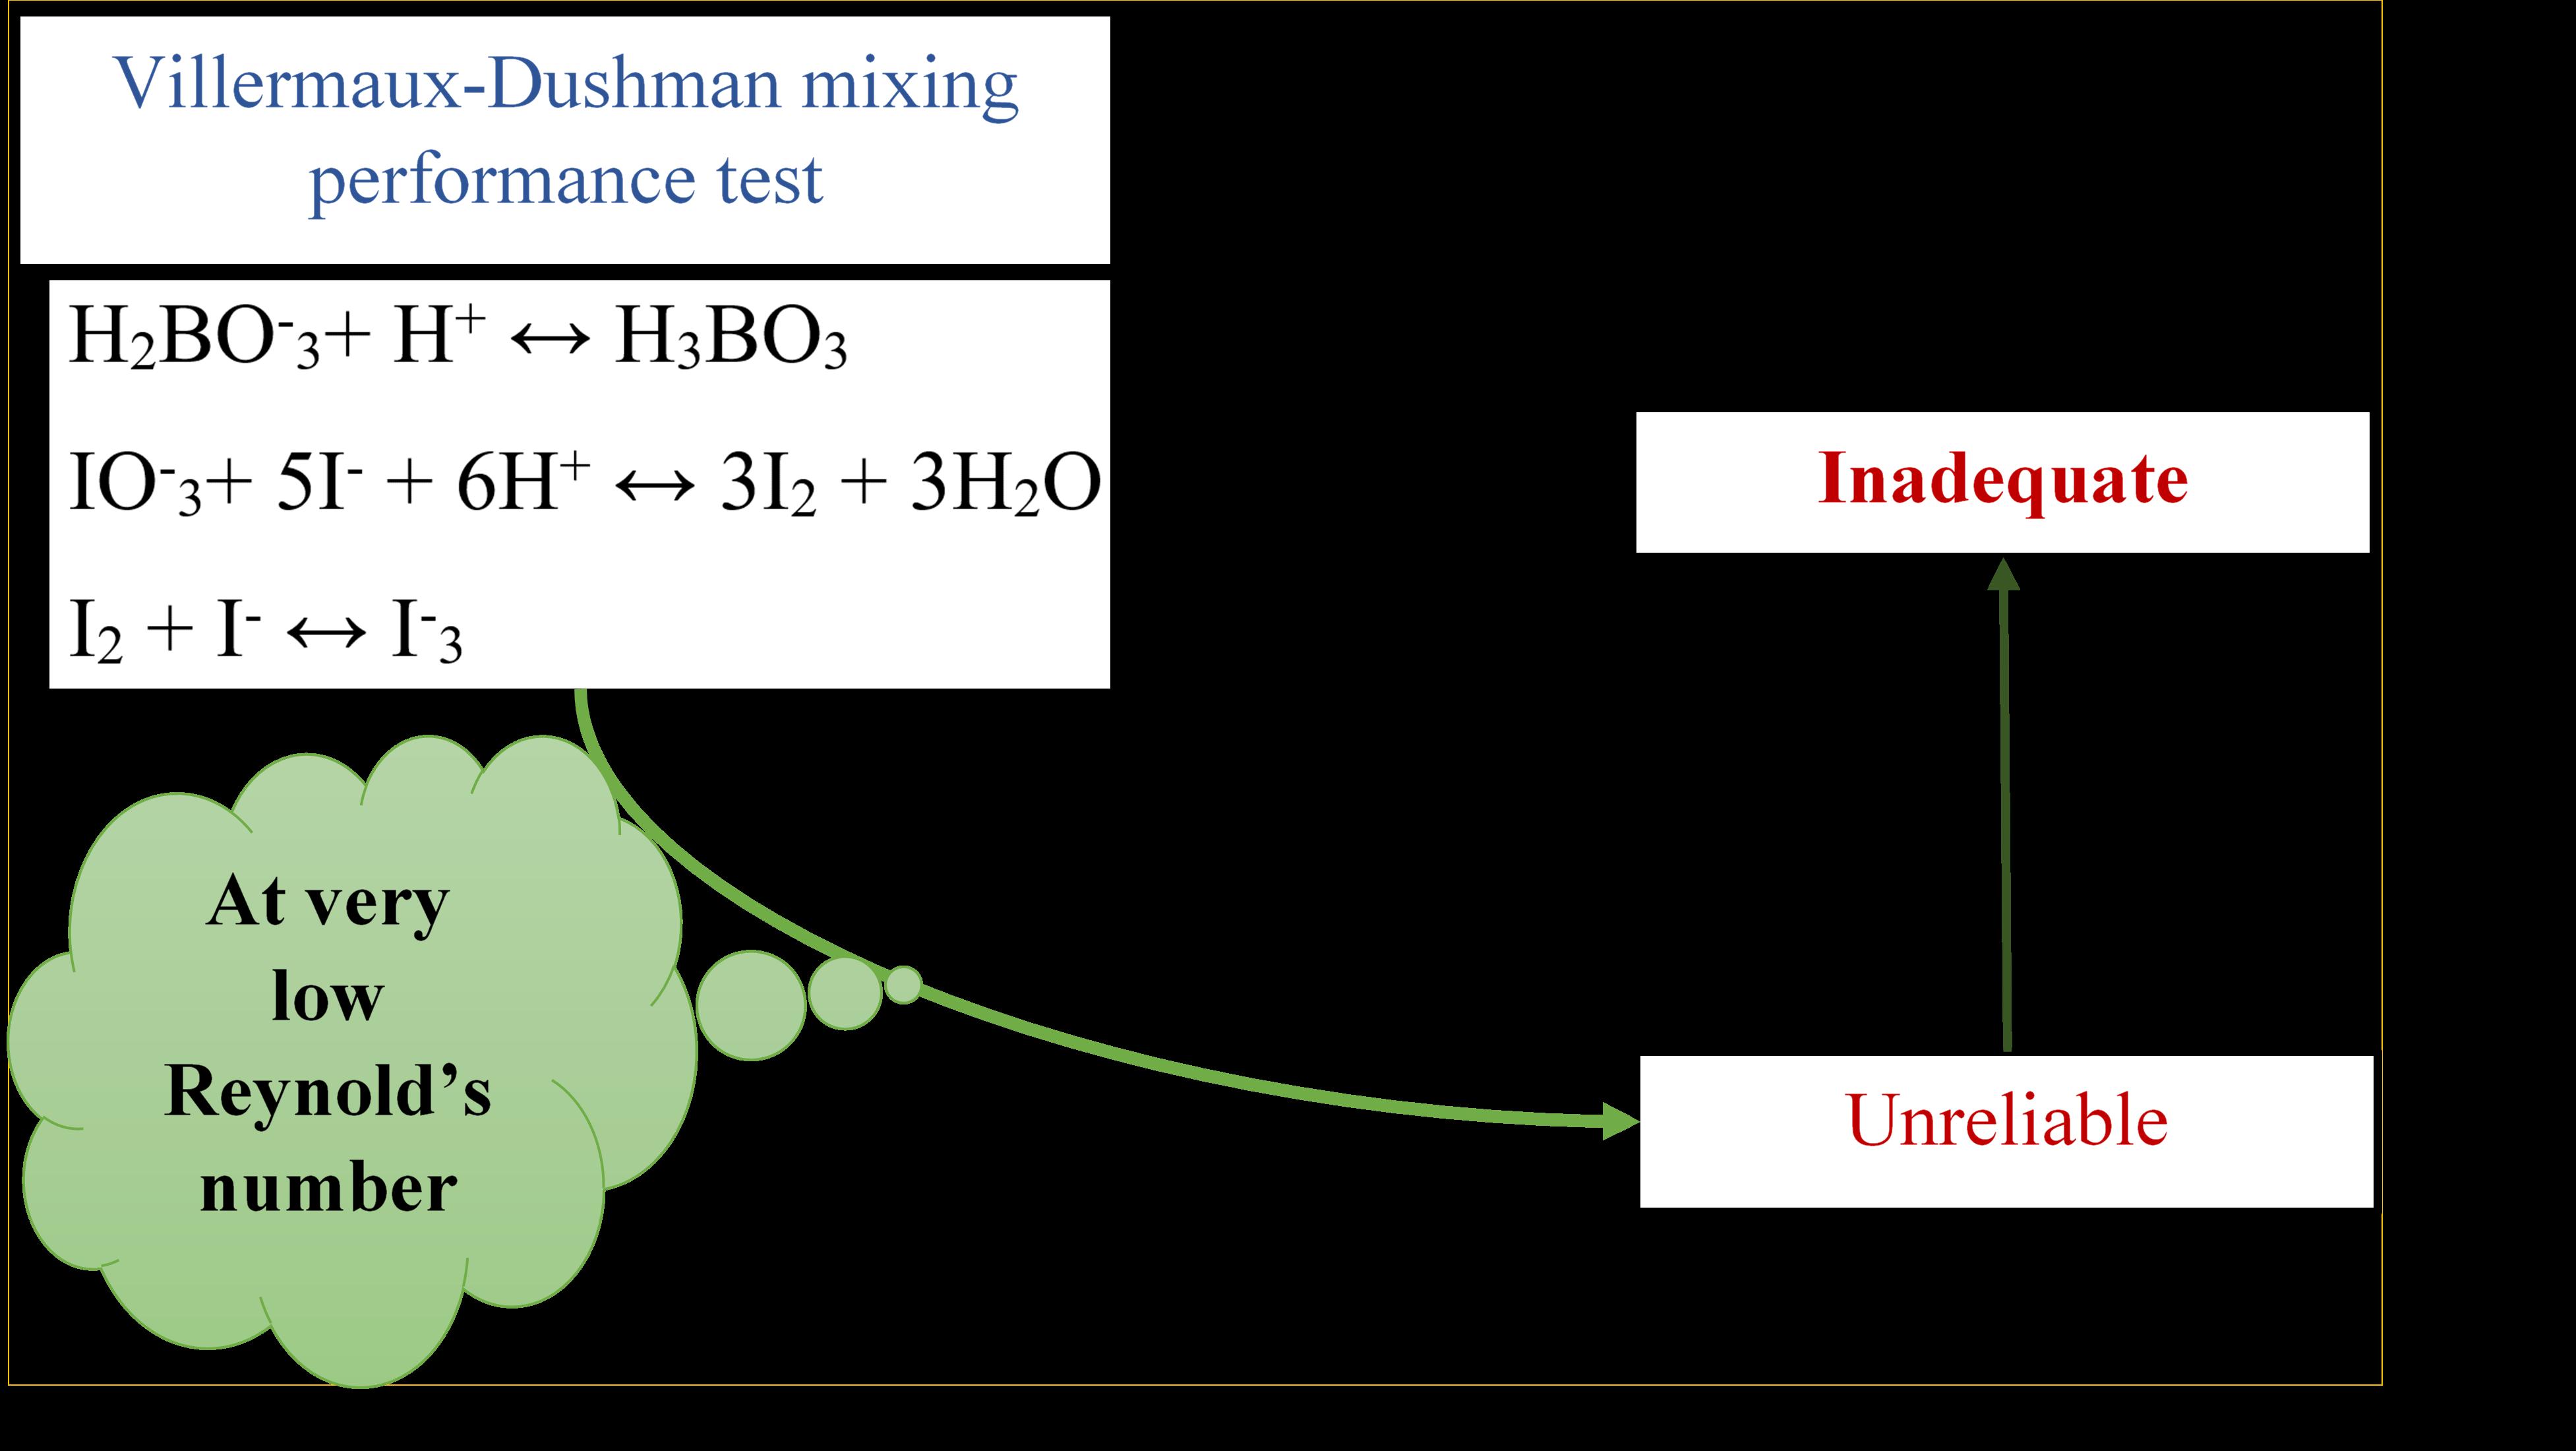 inar flow regime; confluence shape